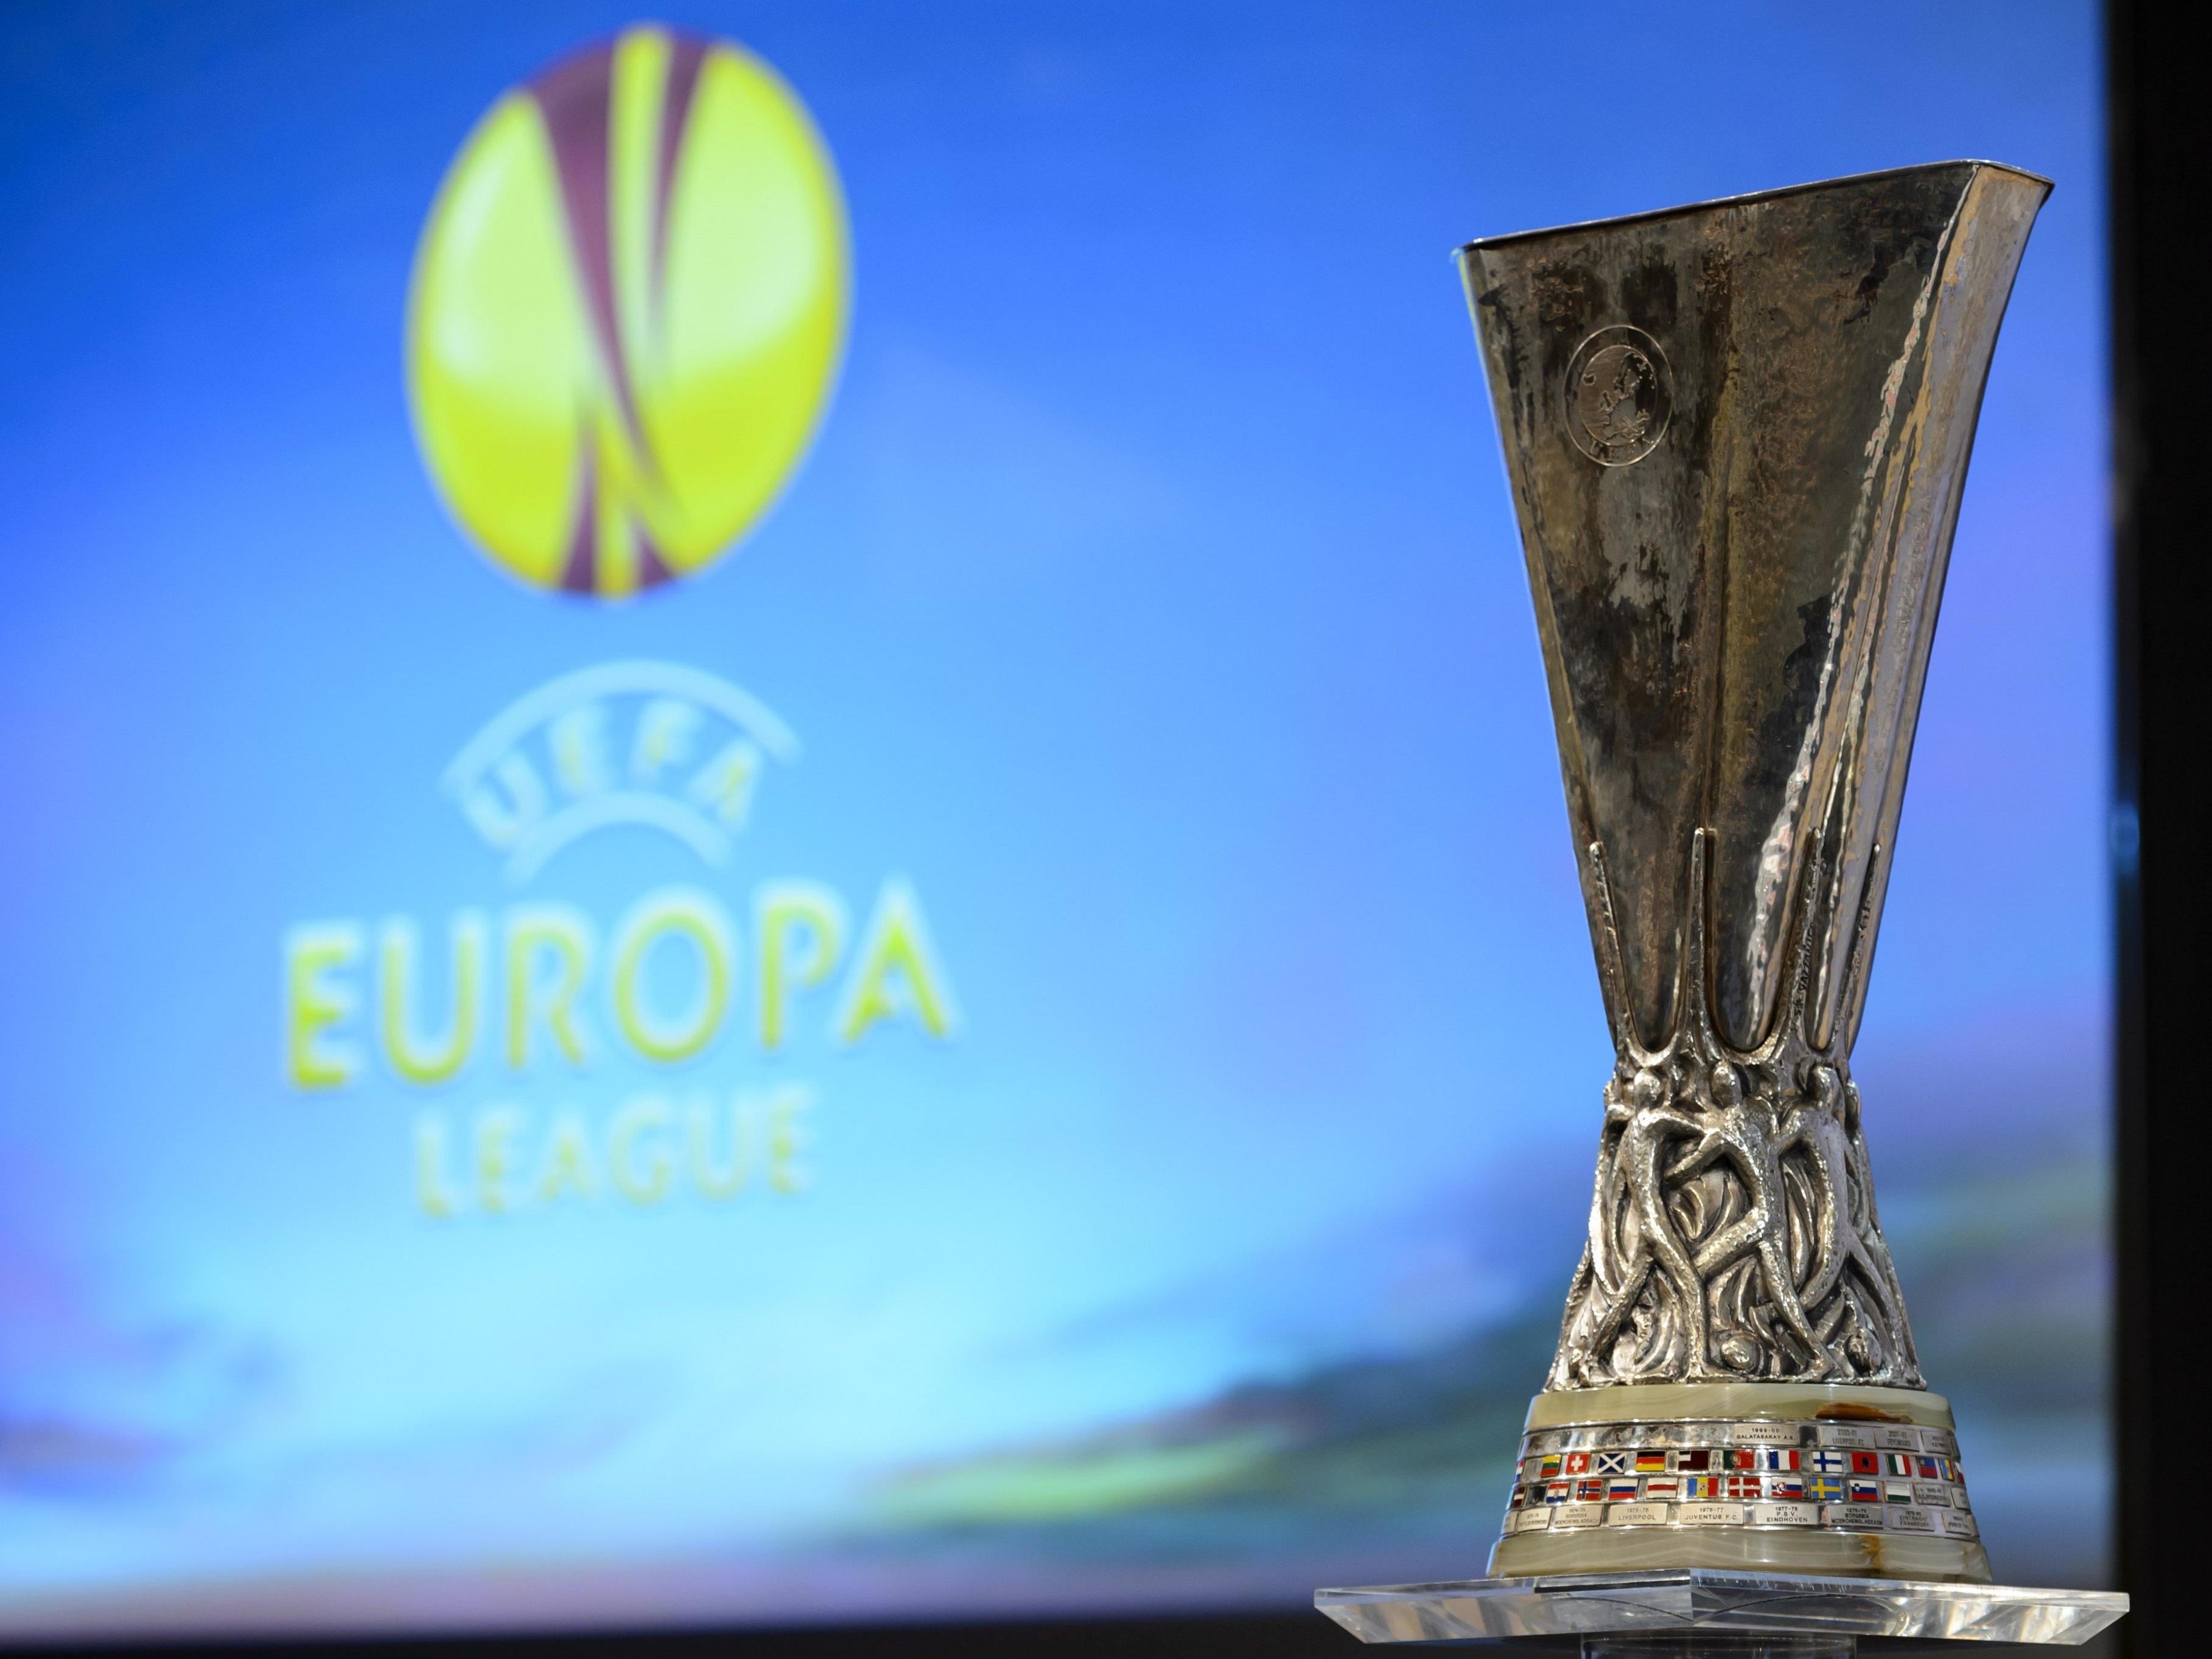 Ab 13 Uhr LIVE: Auslosung der Europa League-Play Offs.